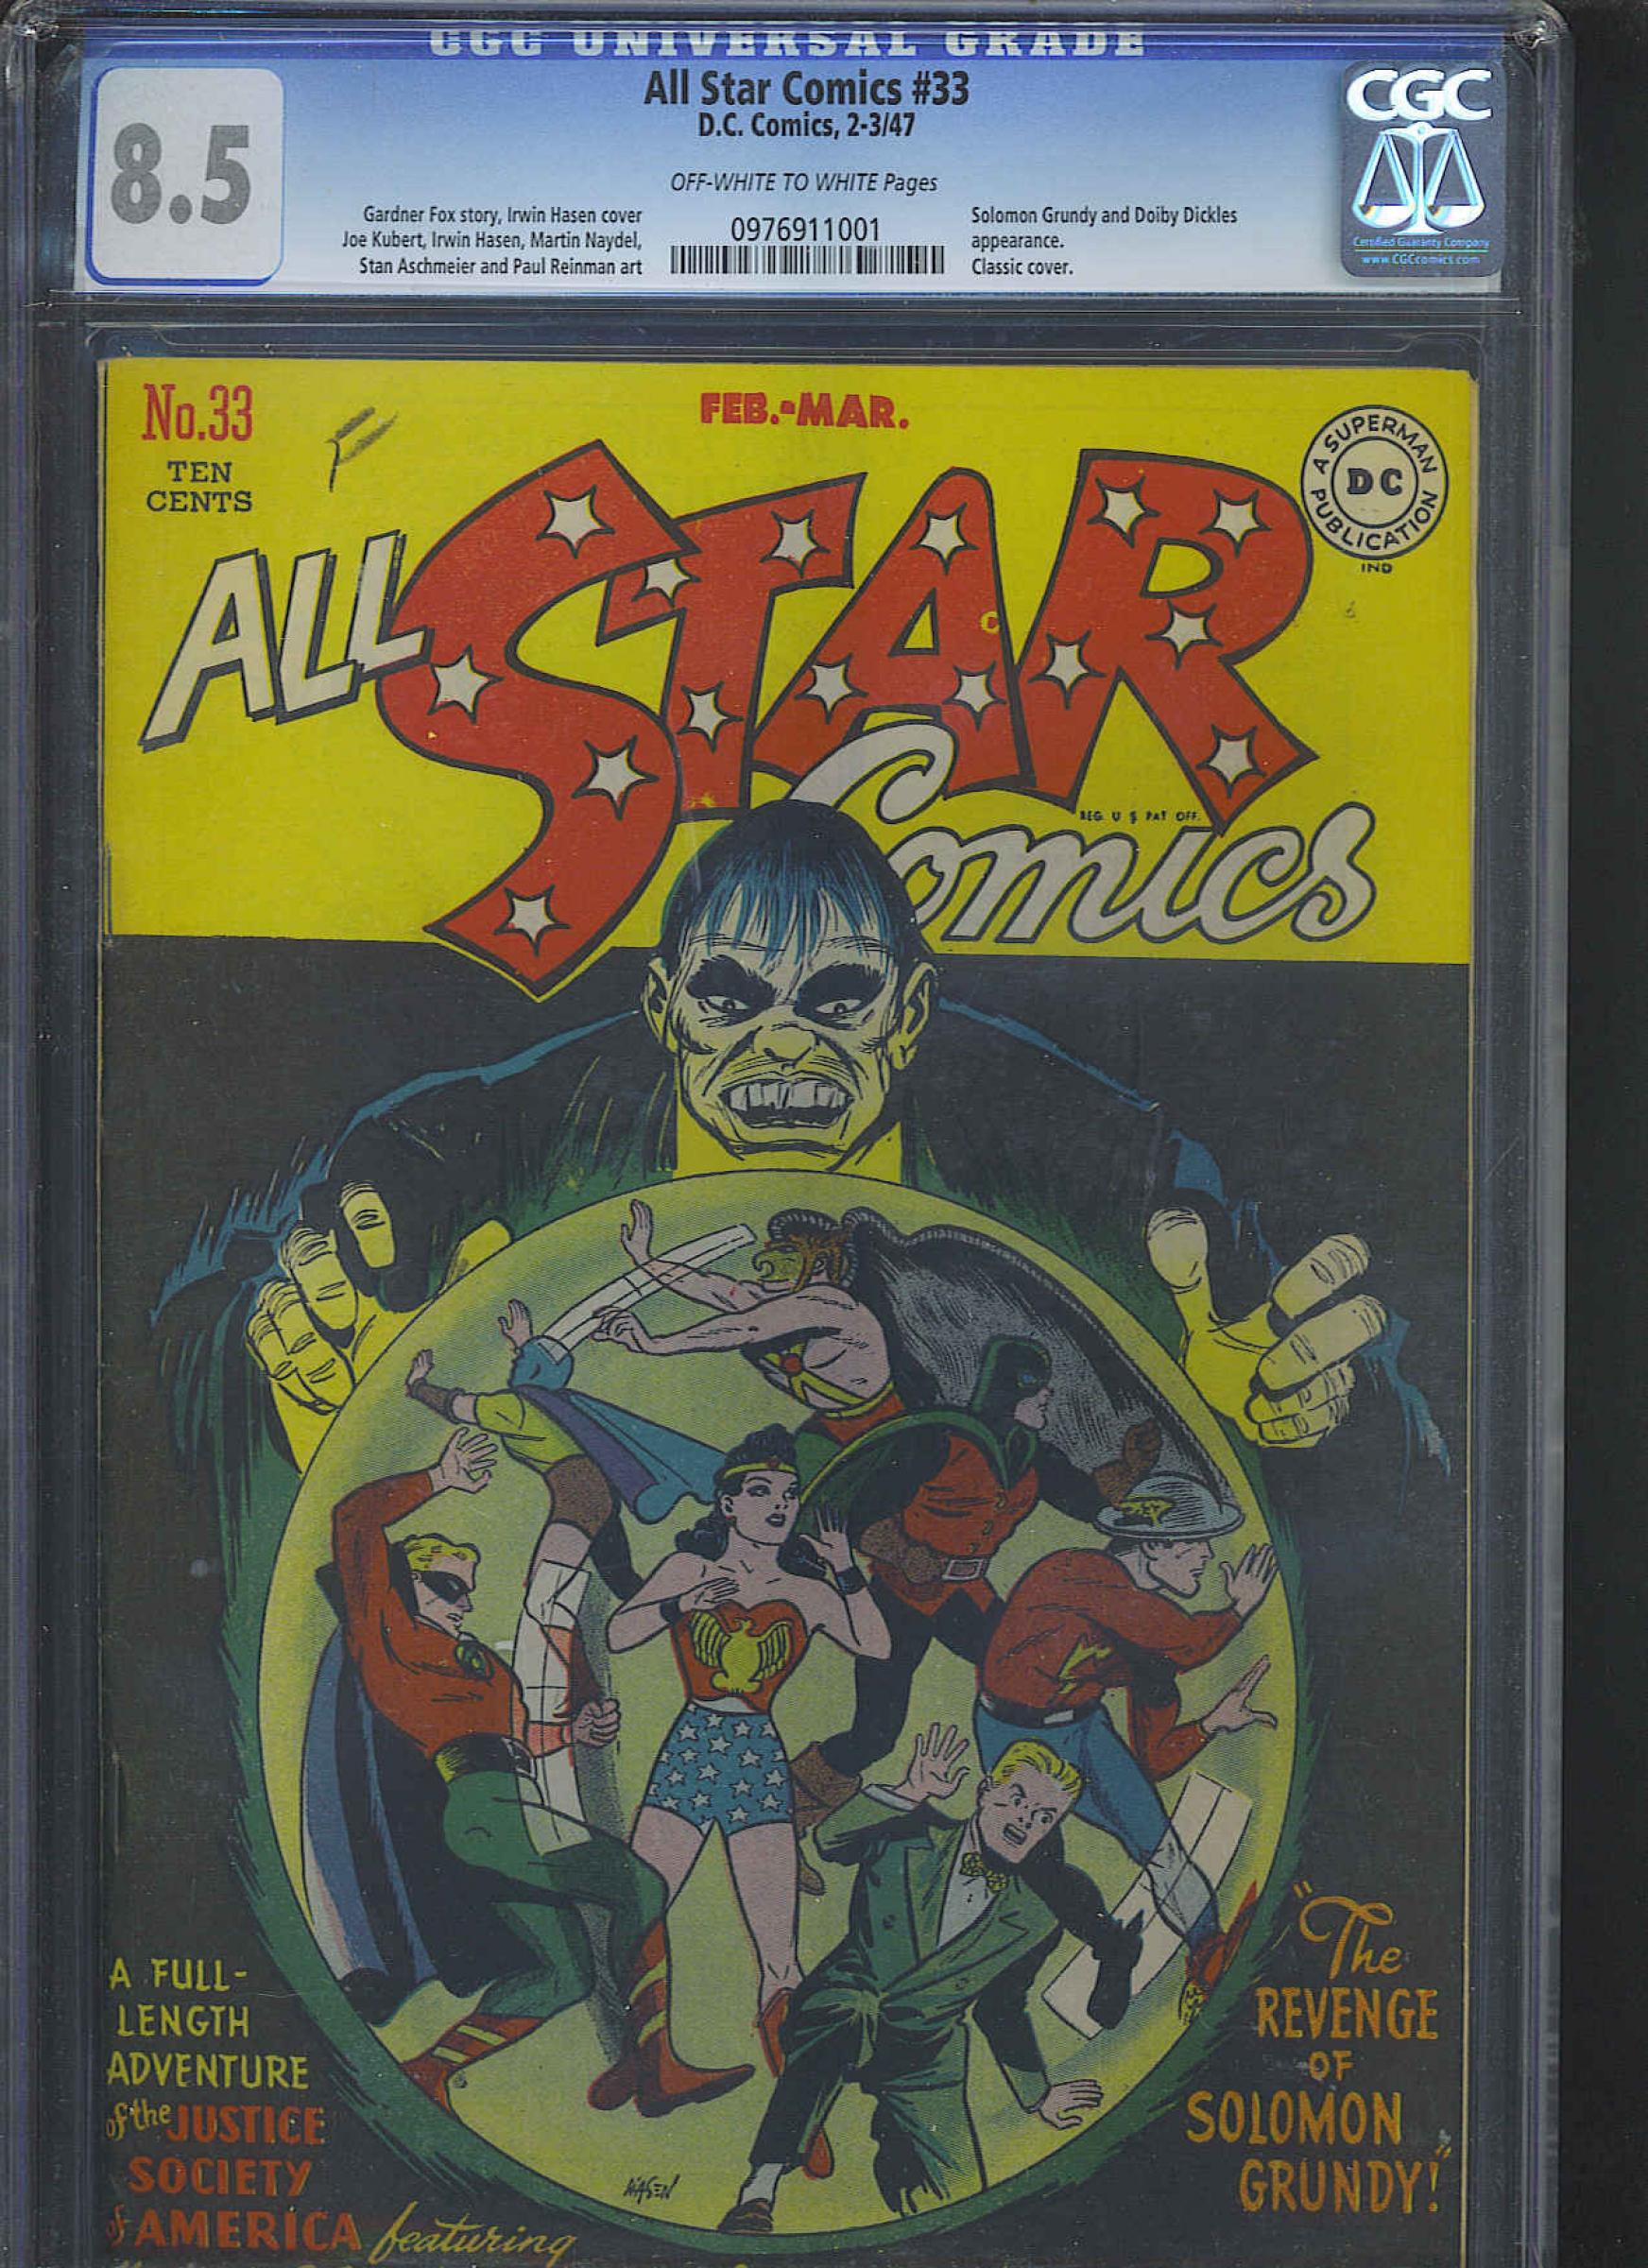 All Star Comics #33 CGC 8.5 ow/w